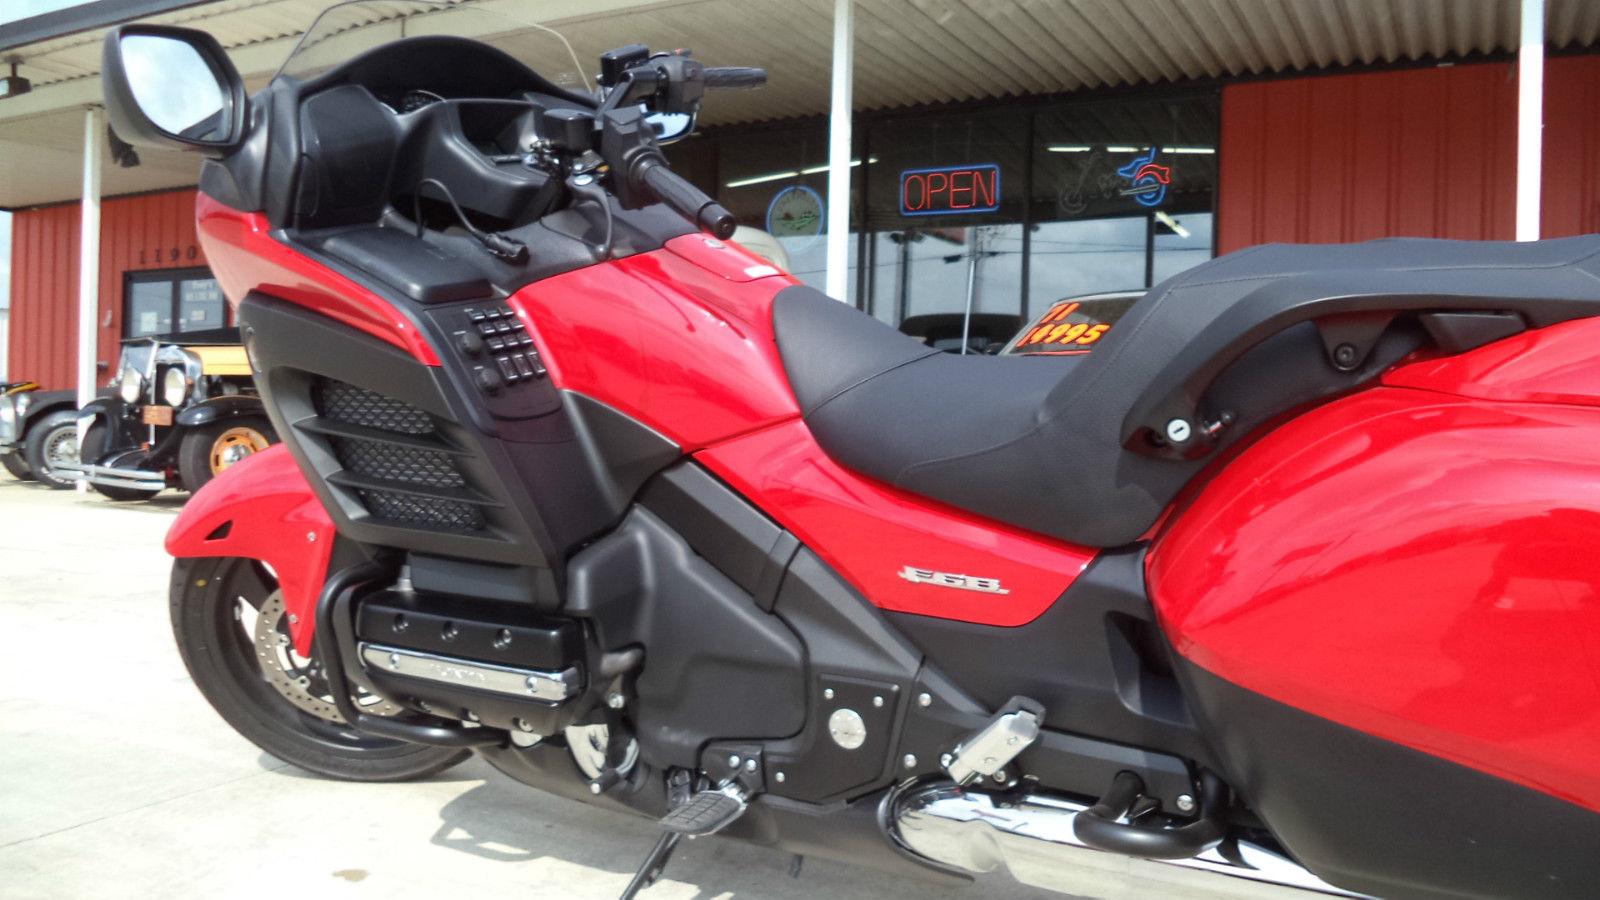 2013 honda f6 b 142 dealer owner riden miles factory for Honda factory warranty